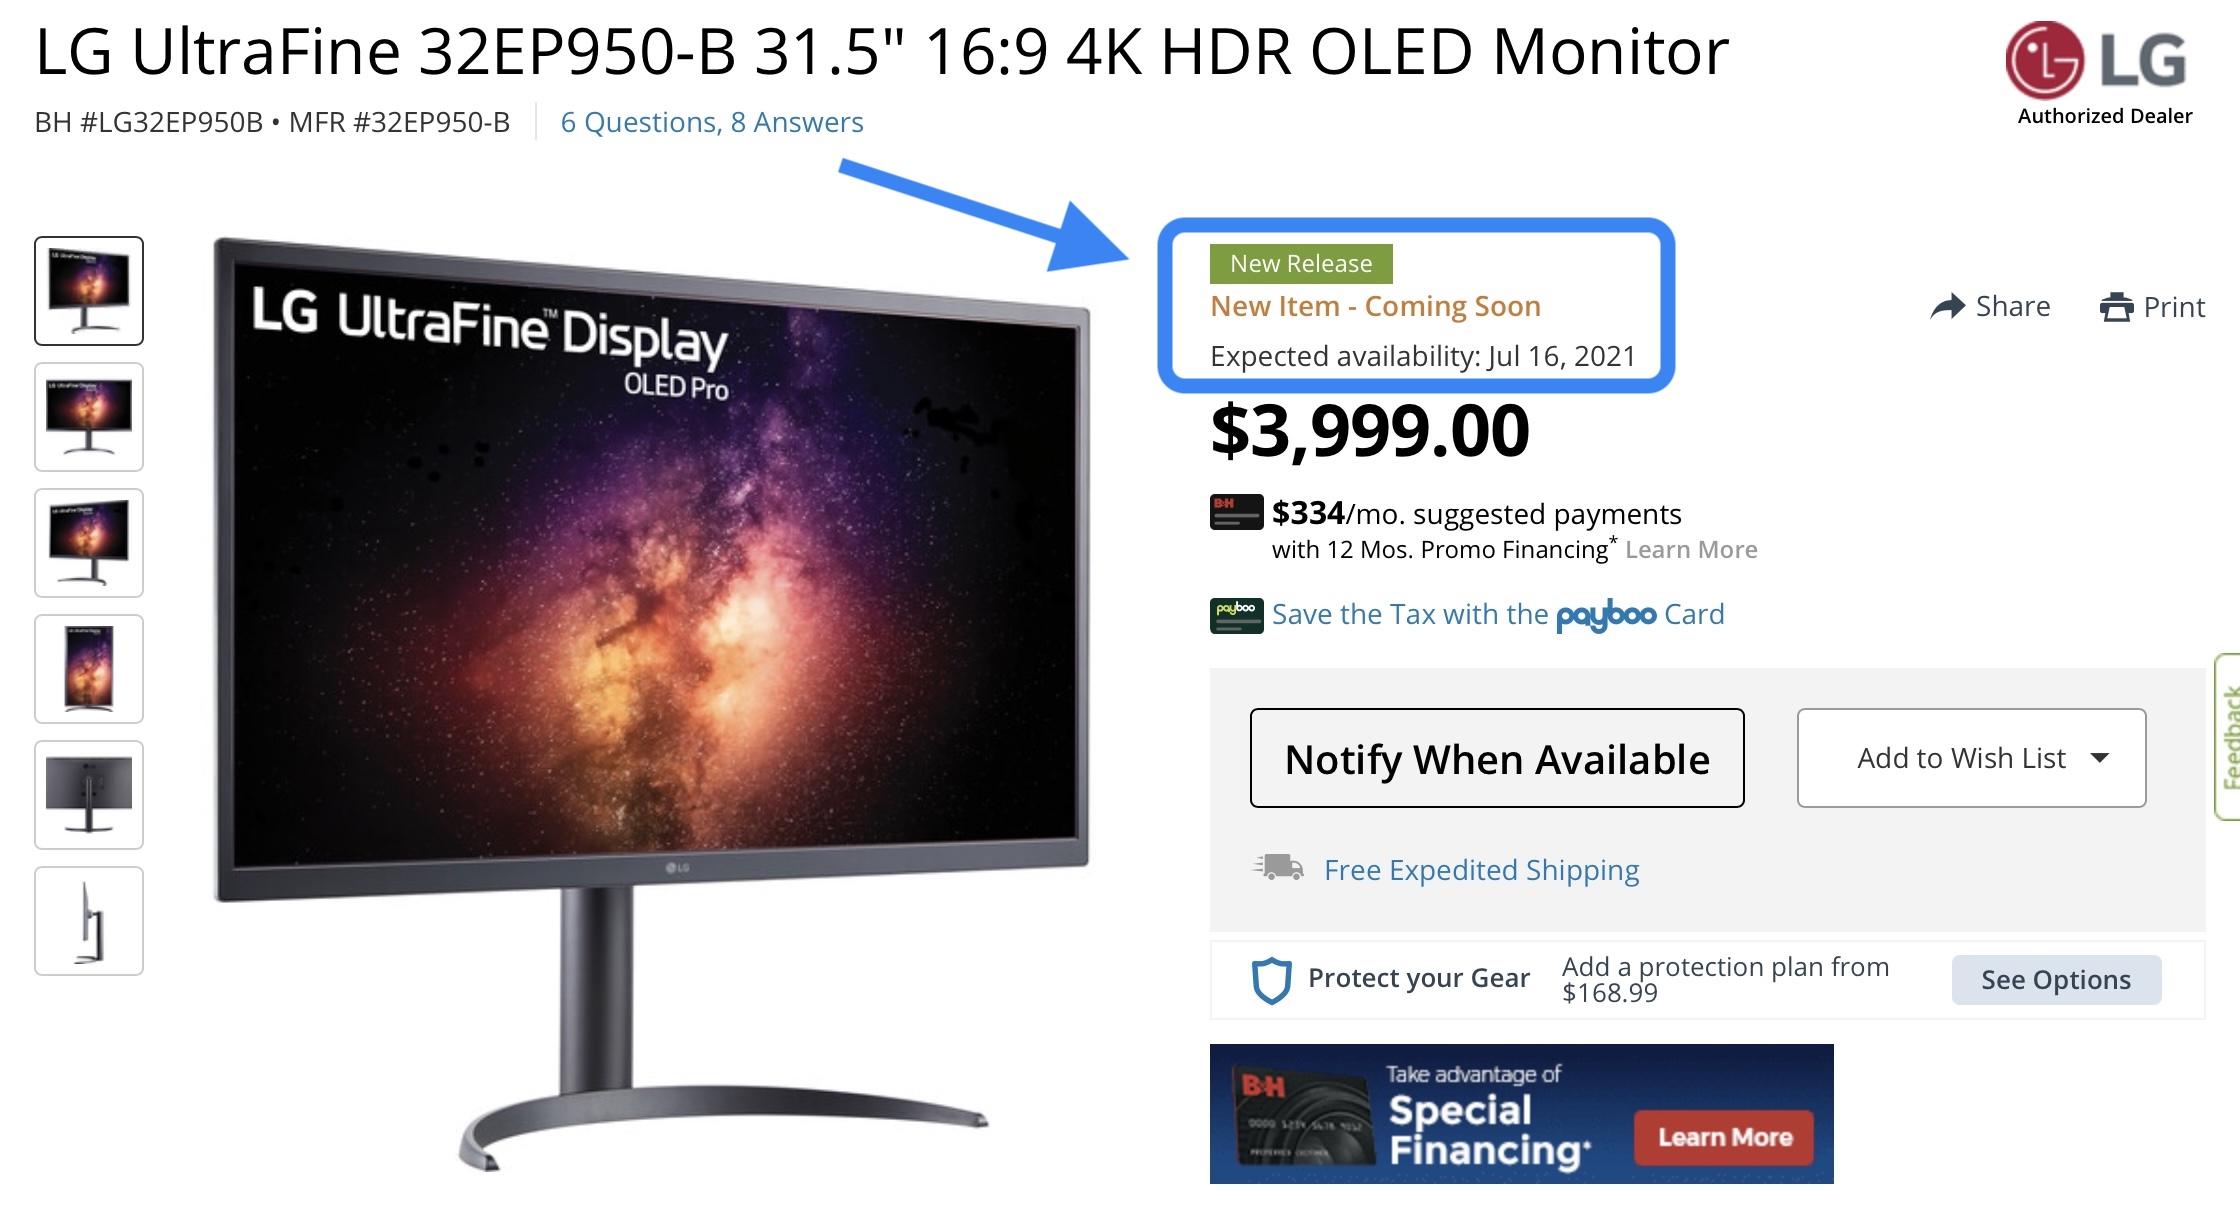 LG UltraFine OLED Pro display - BH Photo product listing